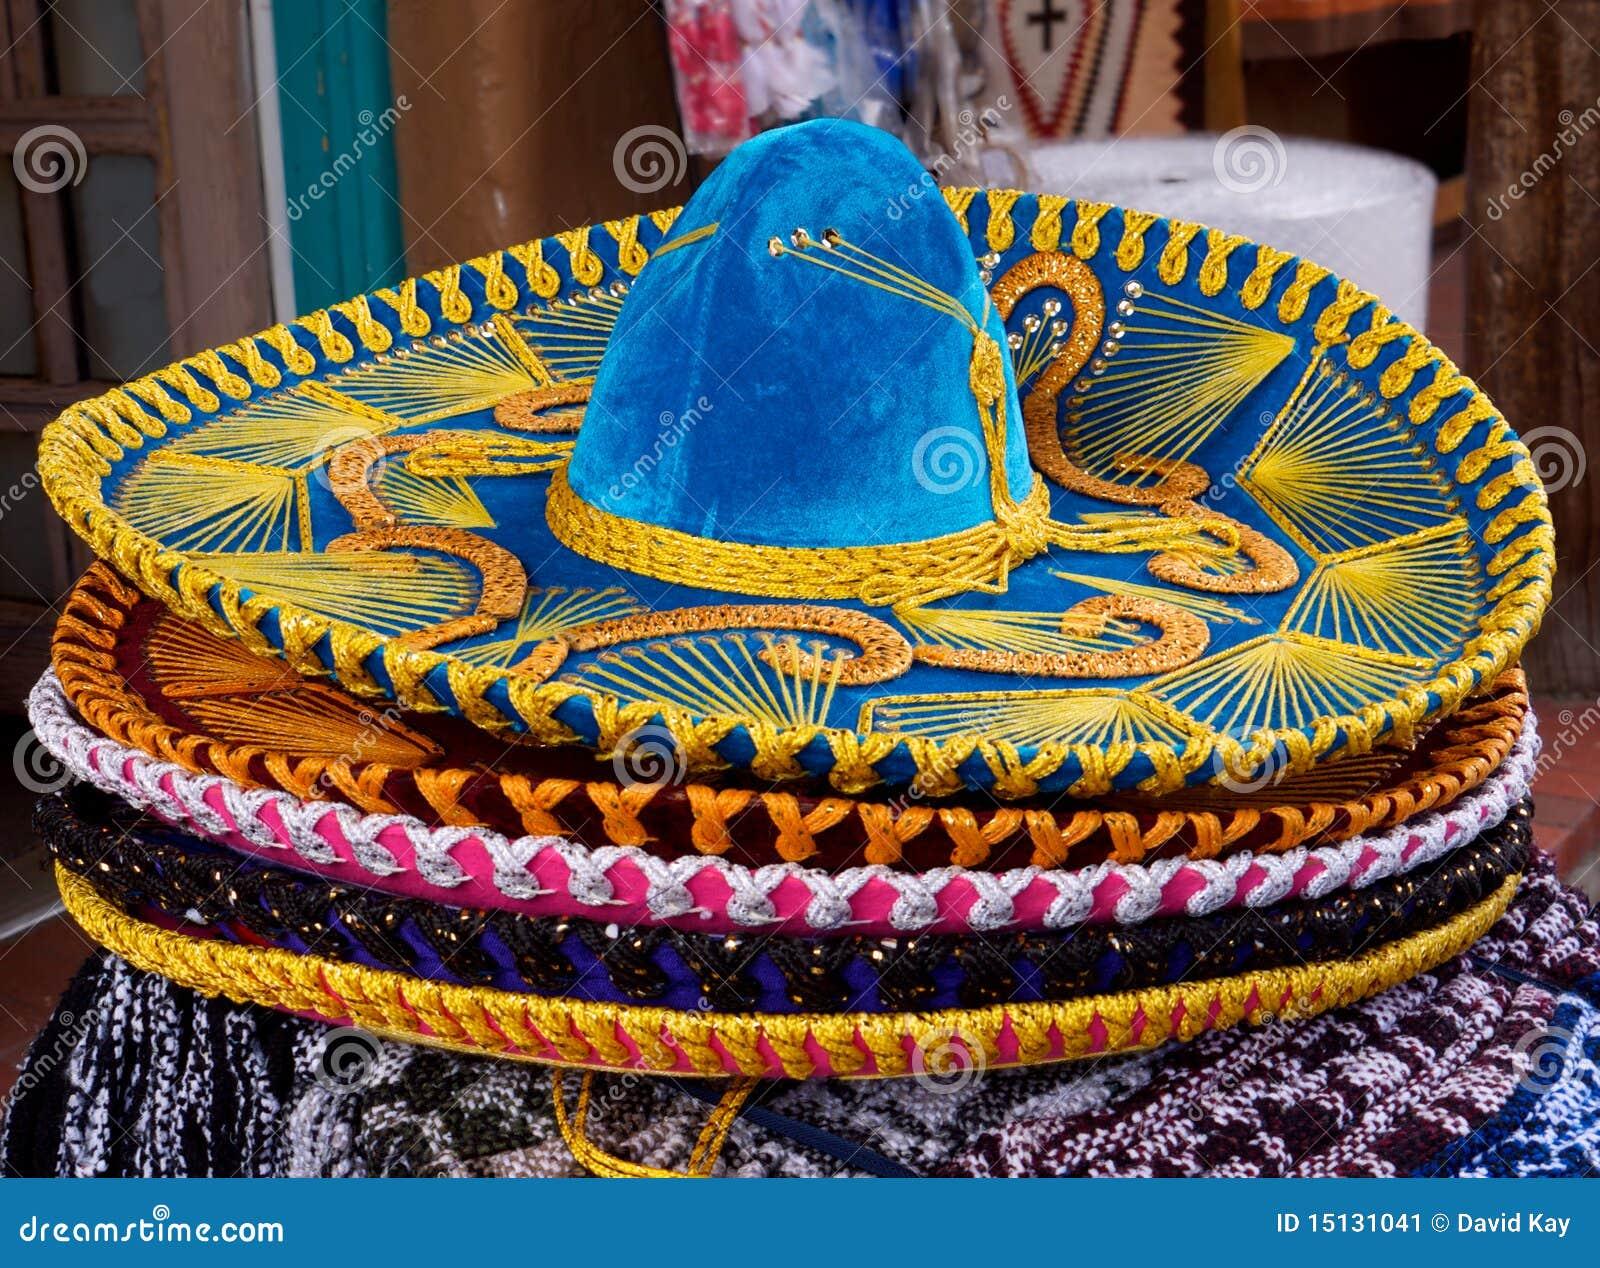 Mexican Sombreros Hats